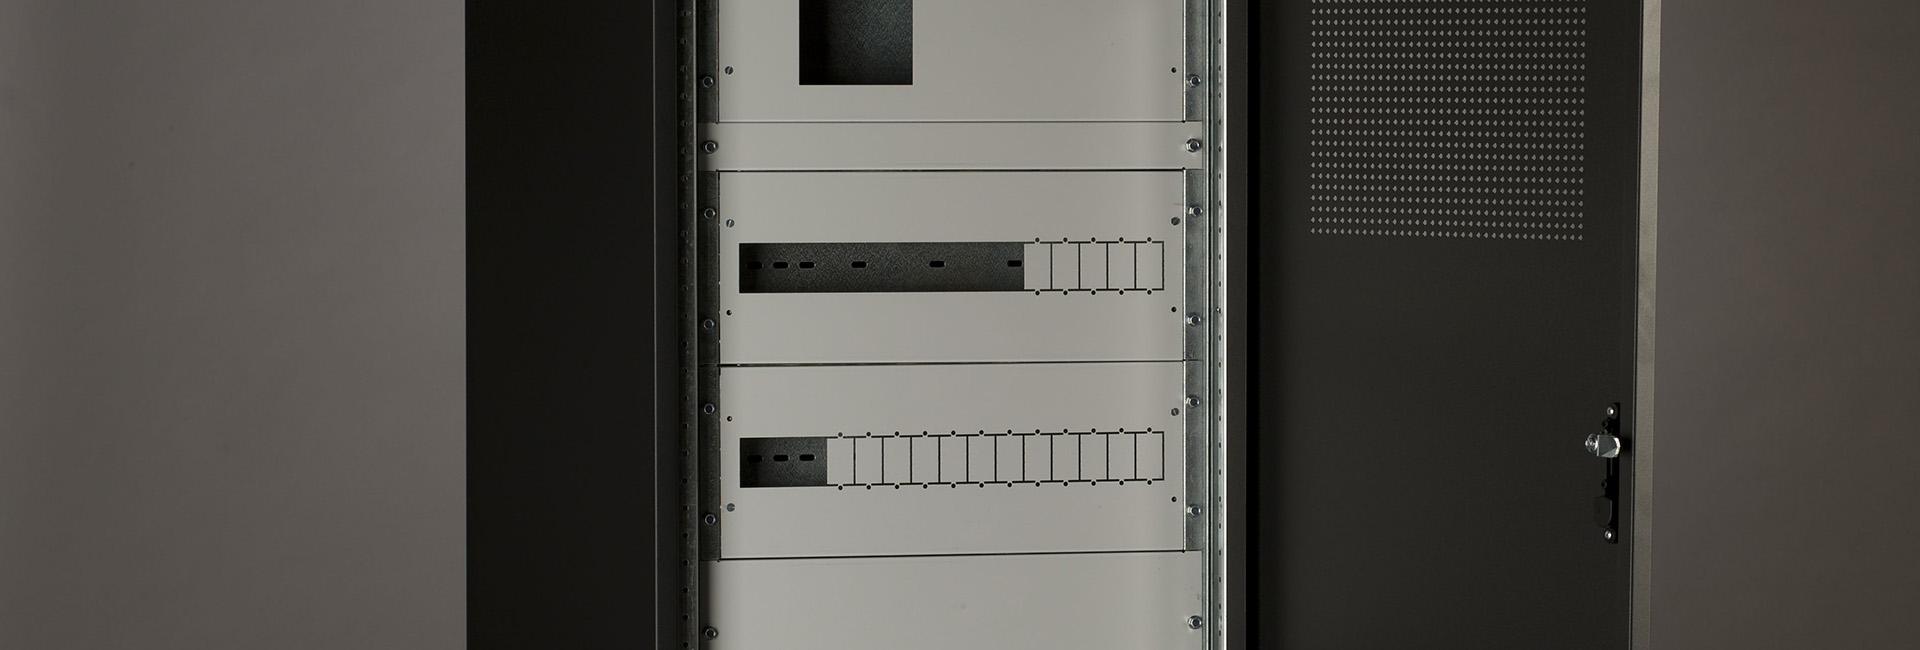 armadio per quadro elettrico